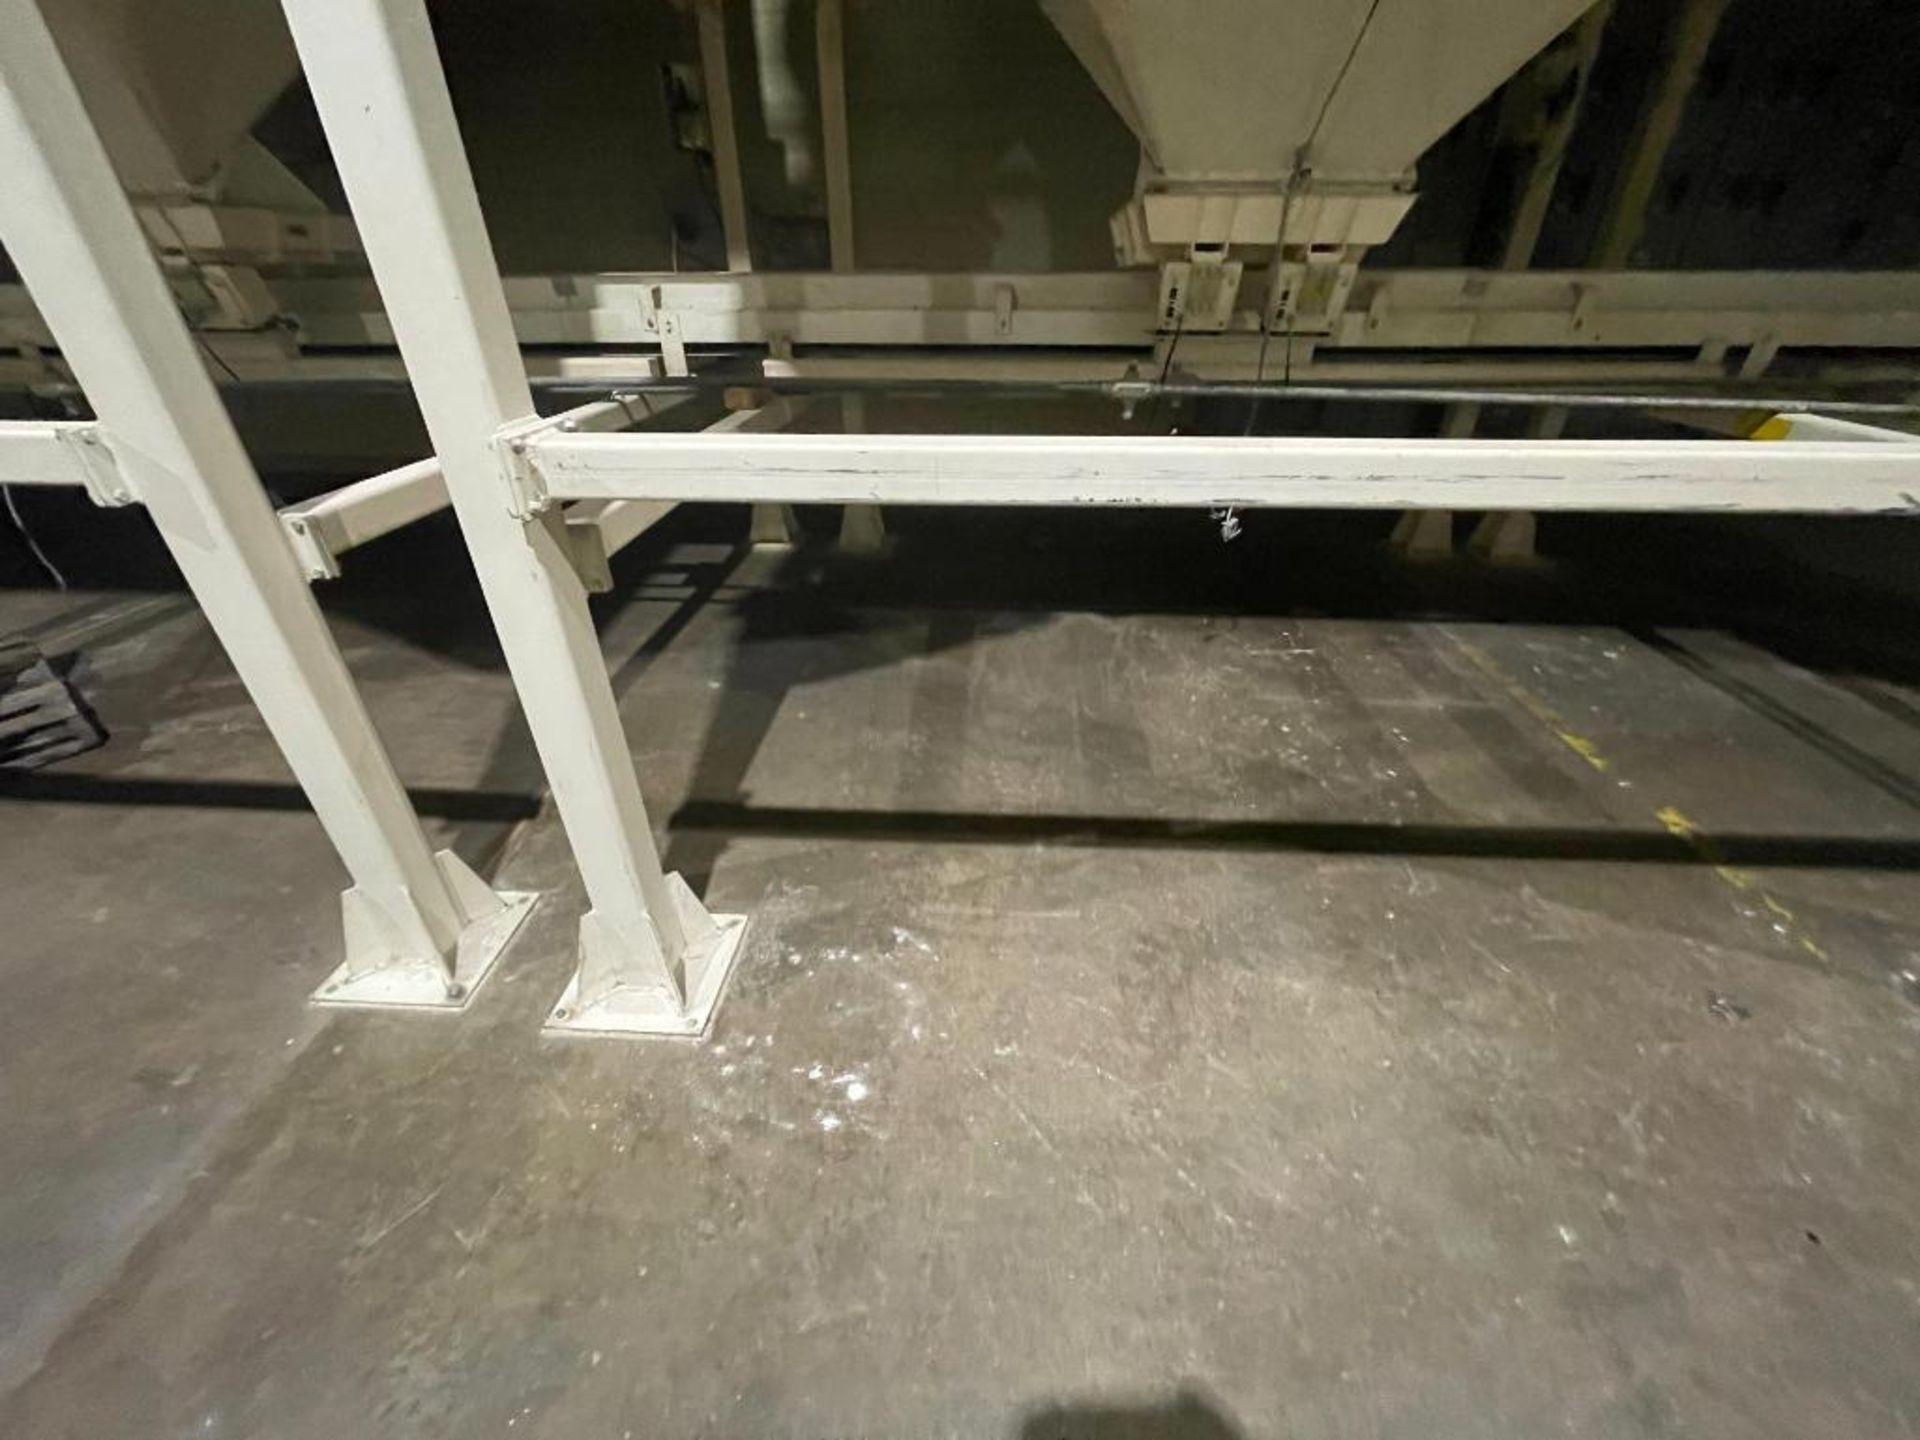 Aseeco mild steel cone bottom bulk storage bin - Image 3 of 28